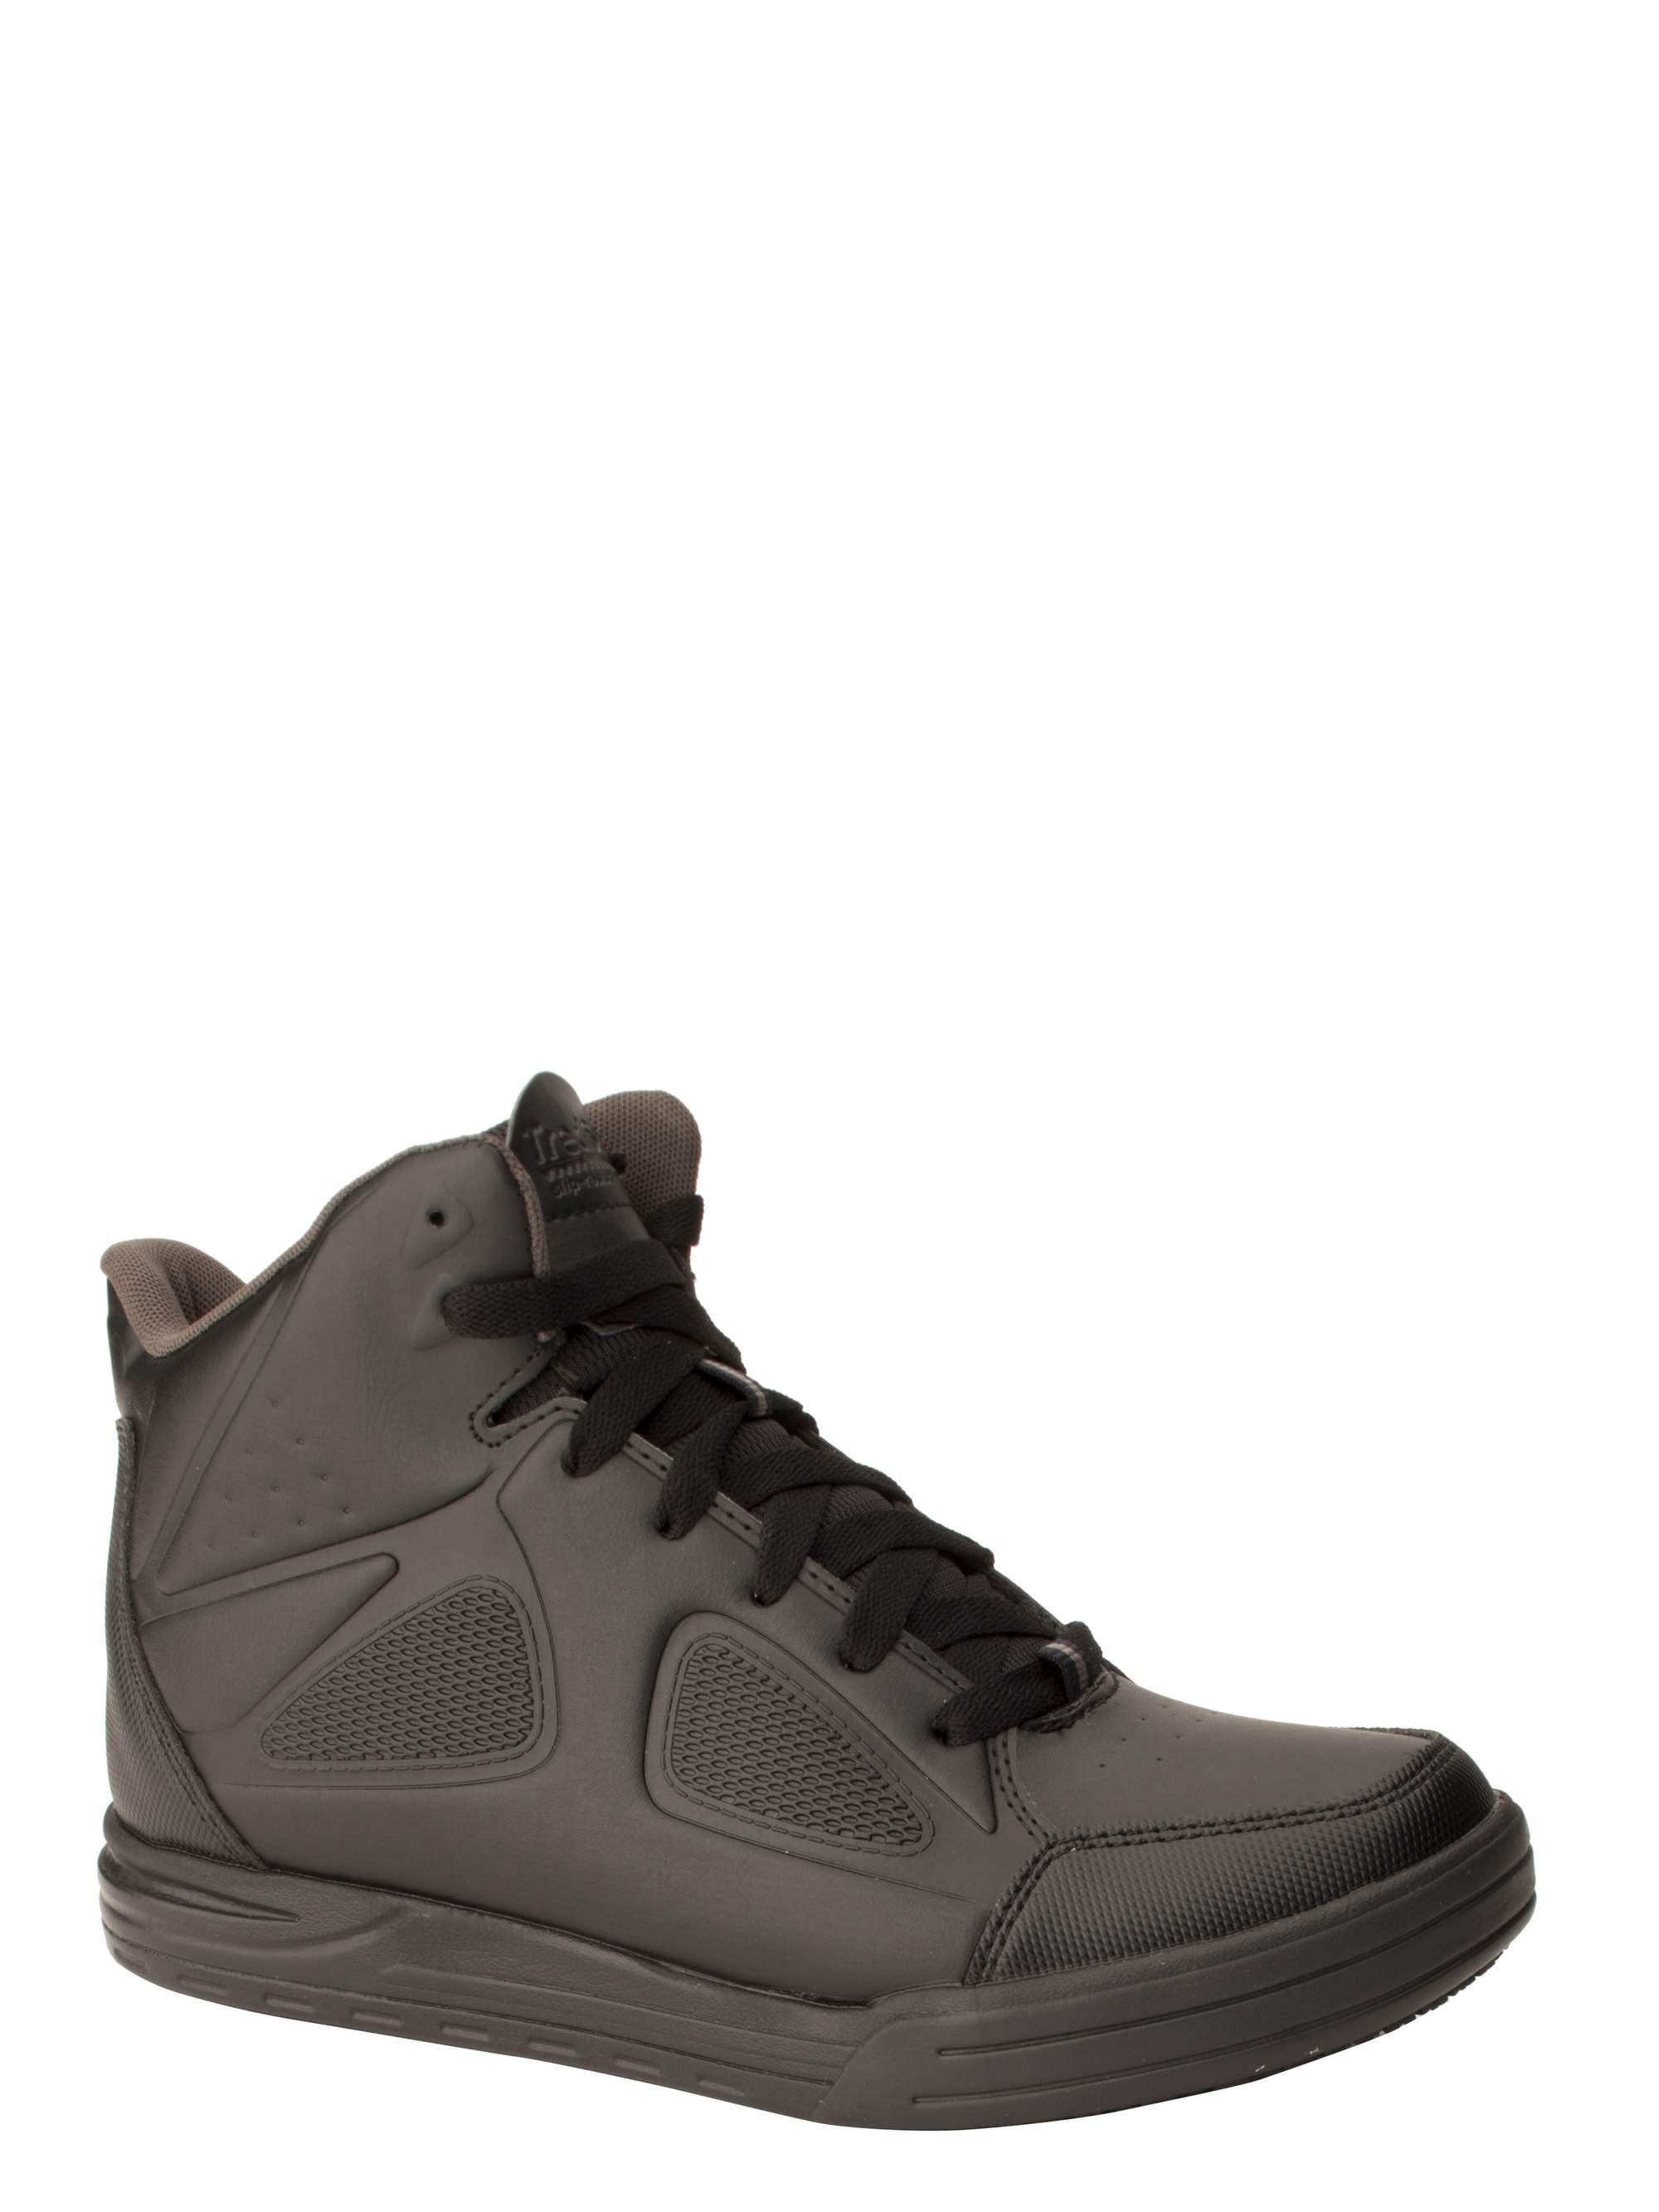 Tredsafe Passit Slip Resistant High Top Work Shoe (Men's)